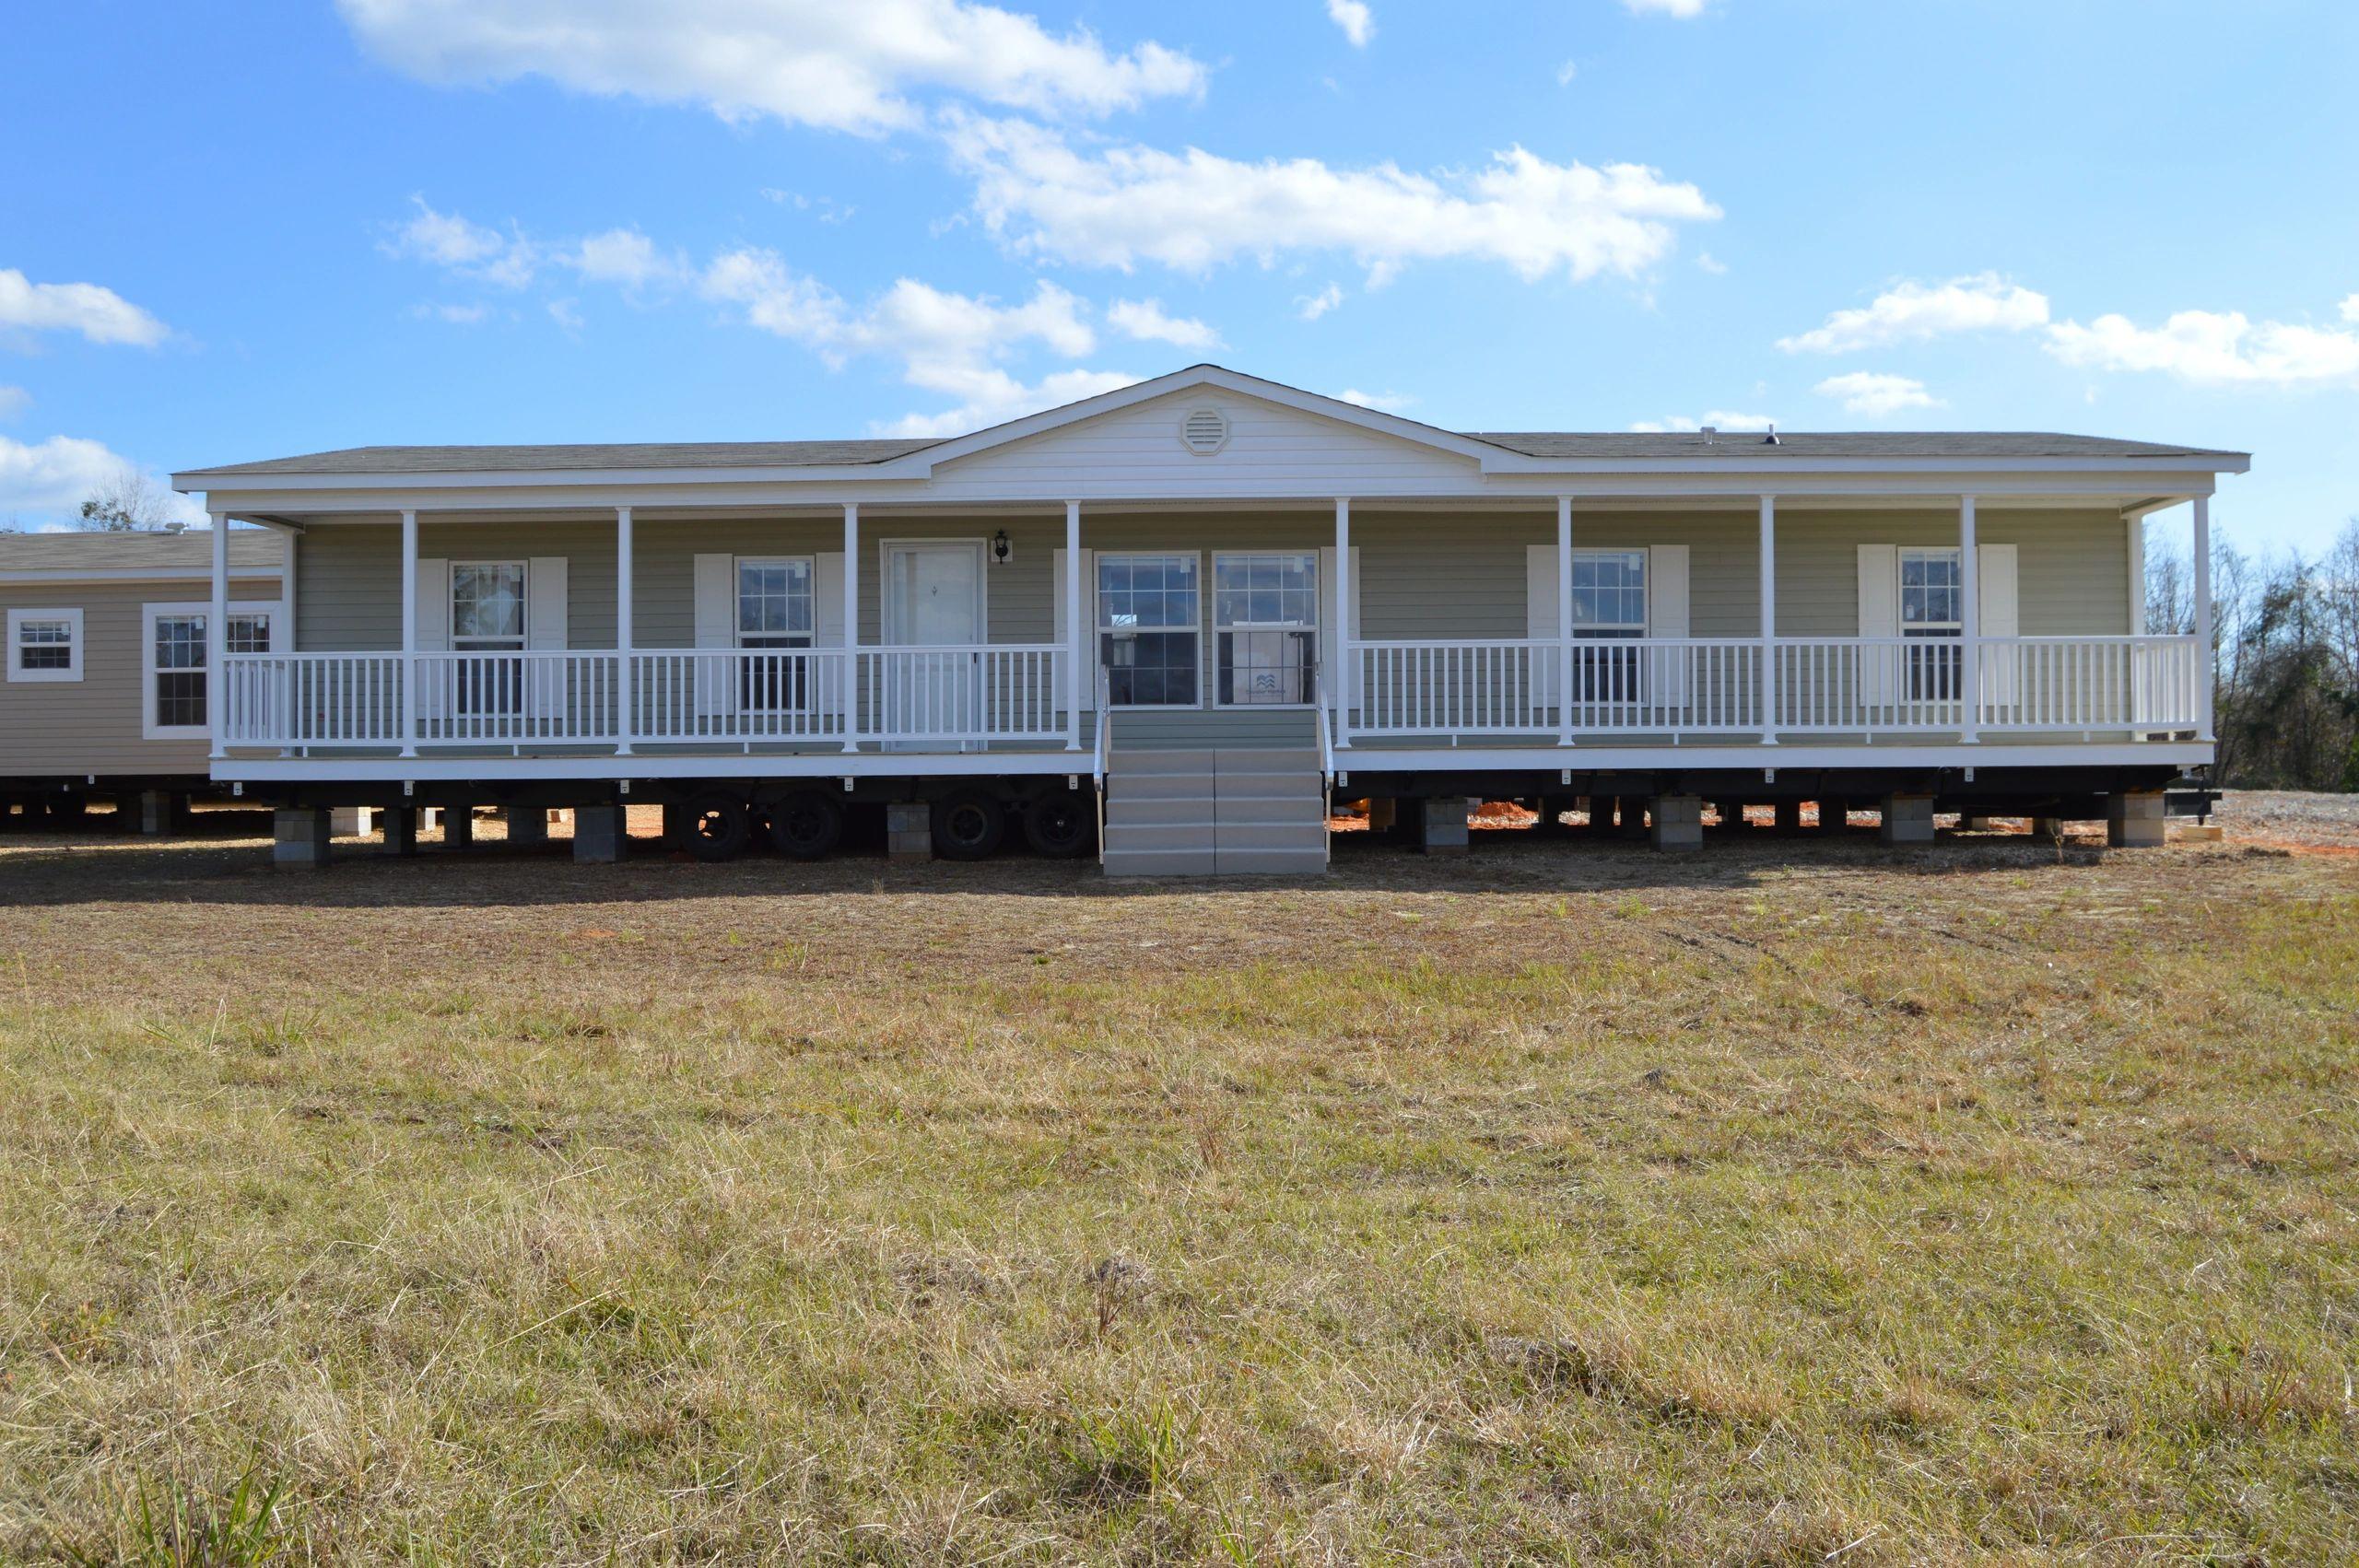 Southern estates mobile home floor plans for Southern estates homes